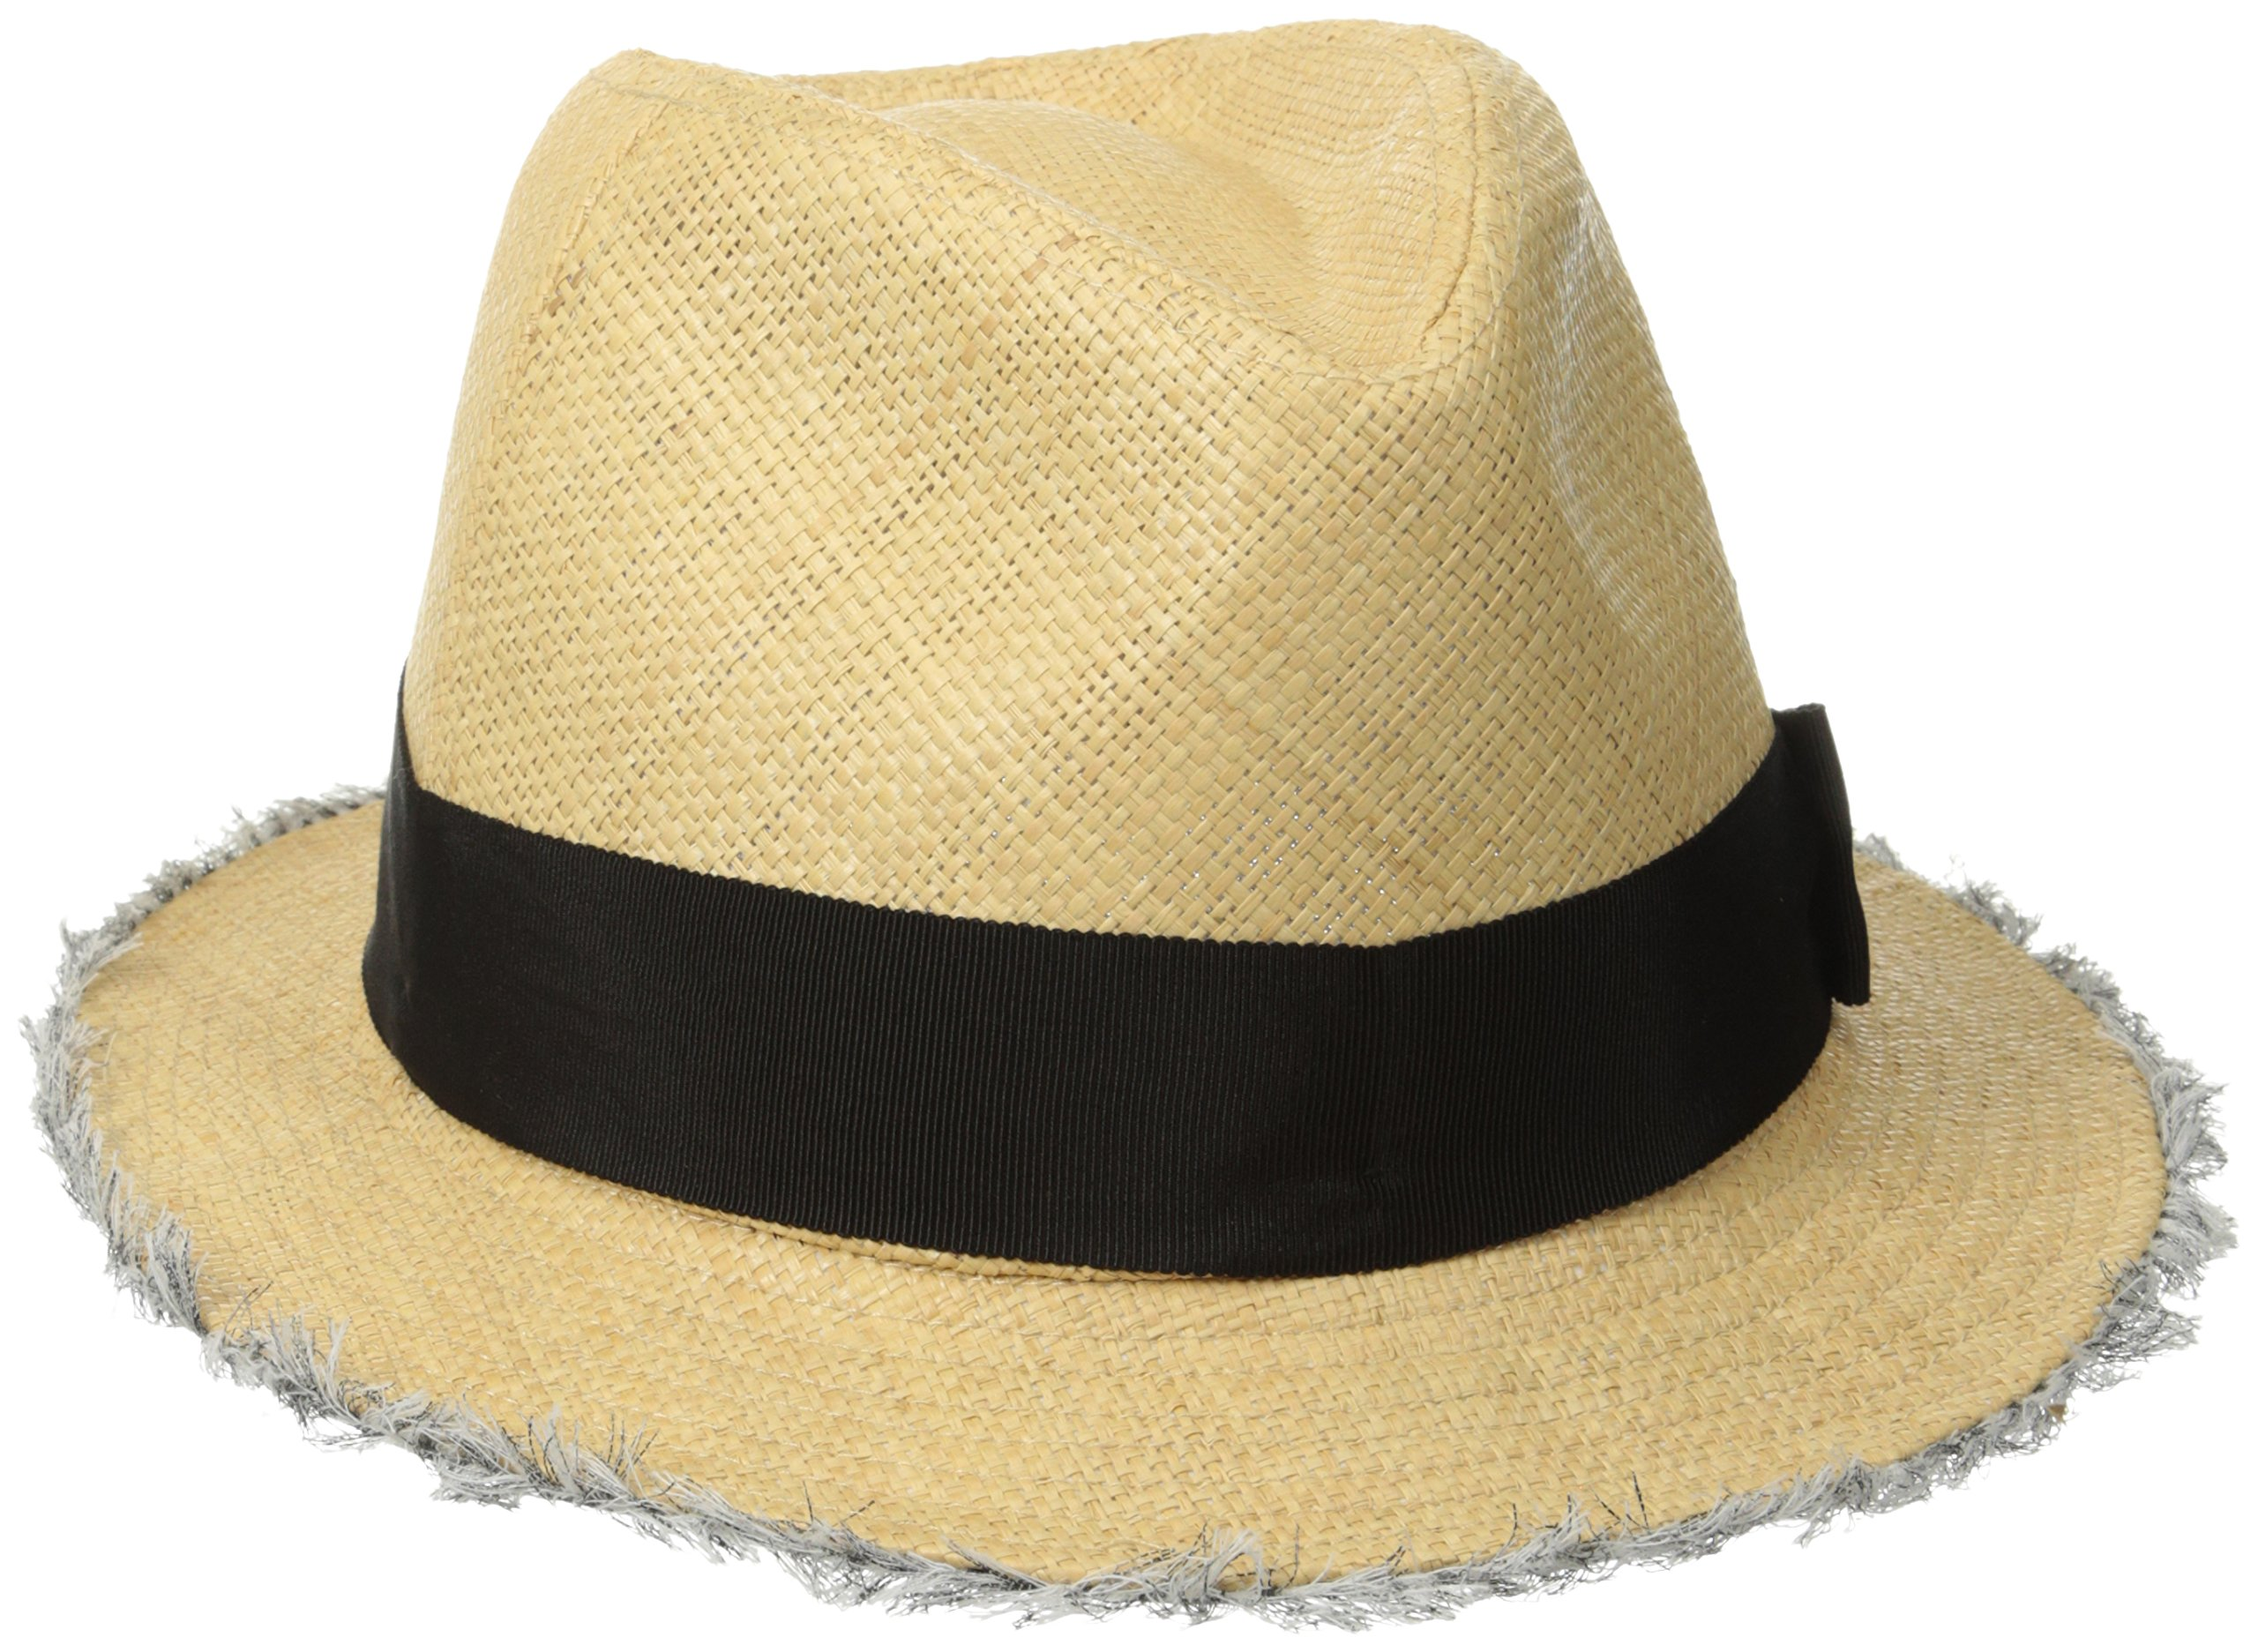 San Diego Hat Company Women's Raffia Fray Edge Panama Fedora with Ribbon Bow, Natural, One Size